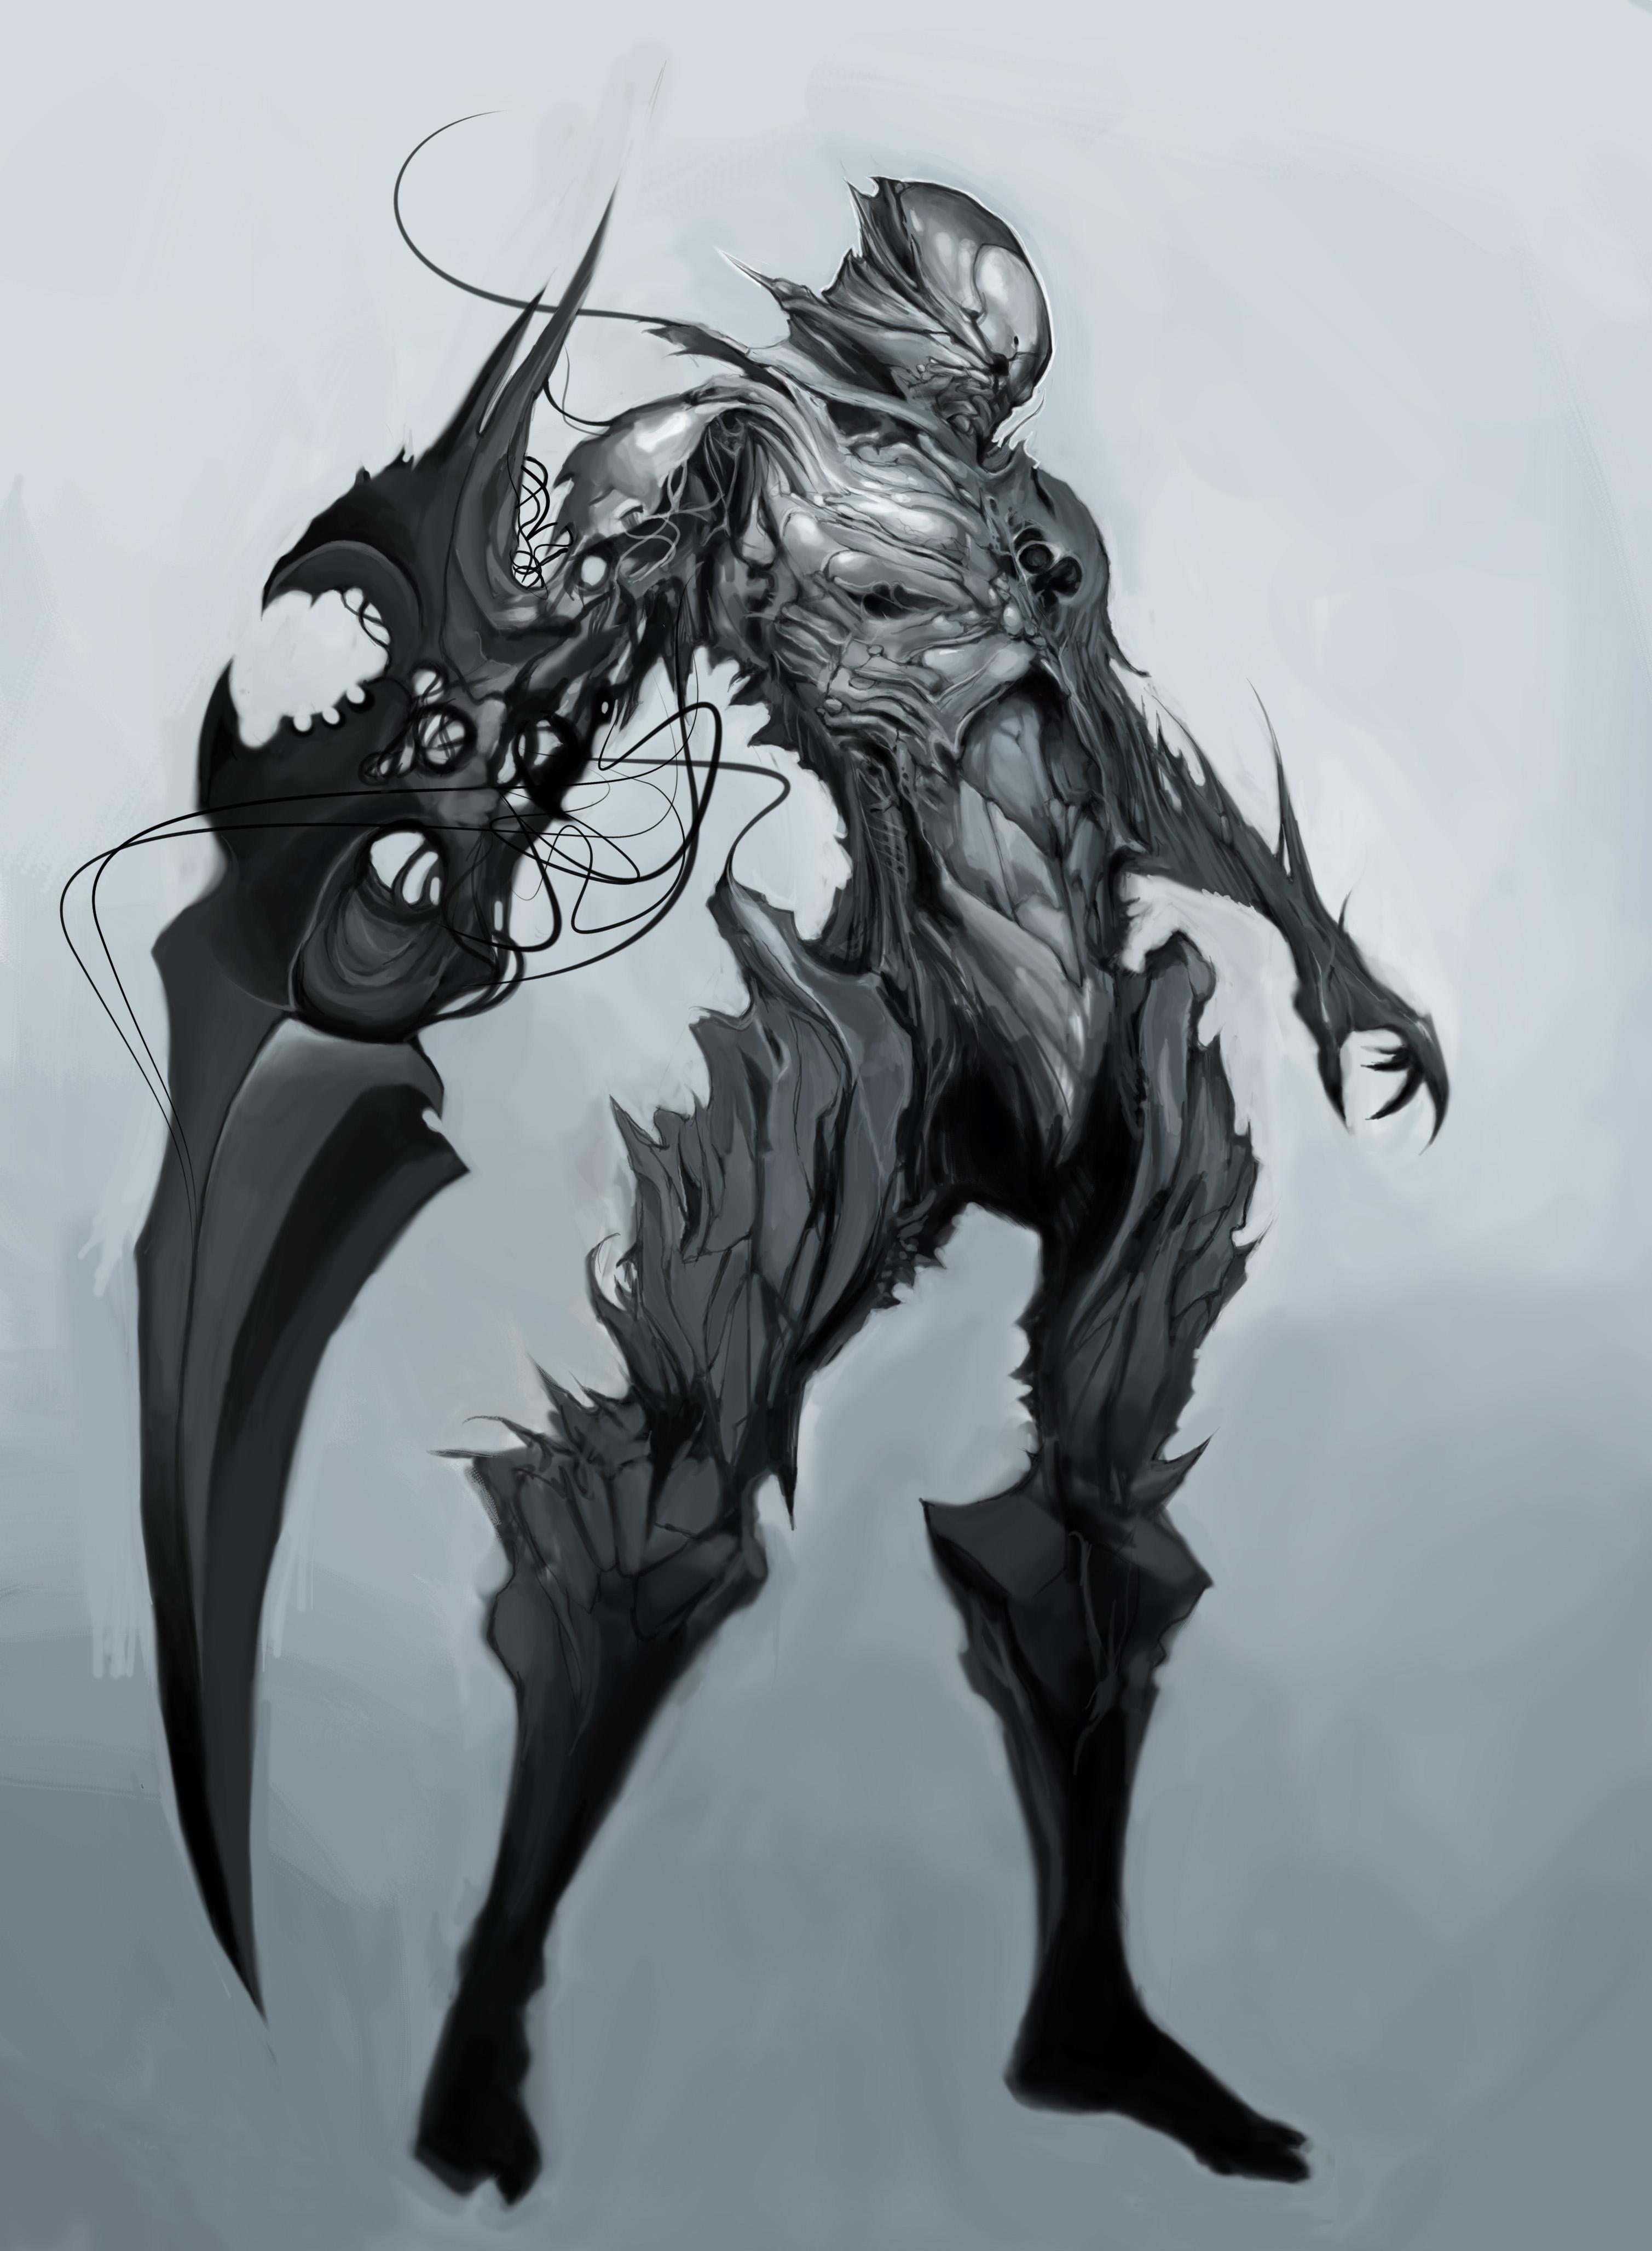 Tapety Vykres Ilustrace Rytir Drak Demon Mytologie Umeni